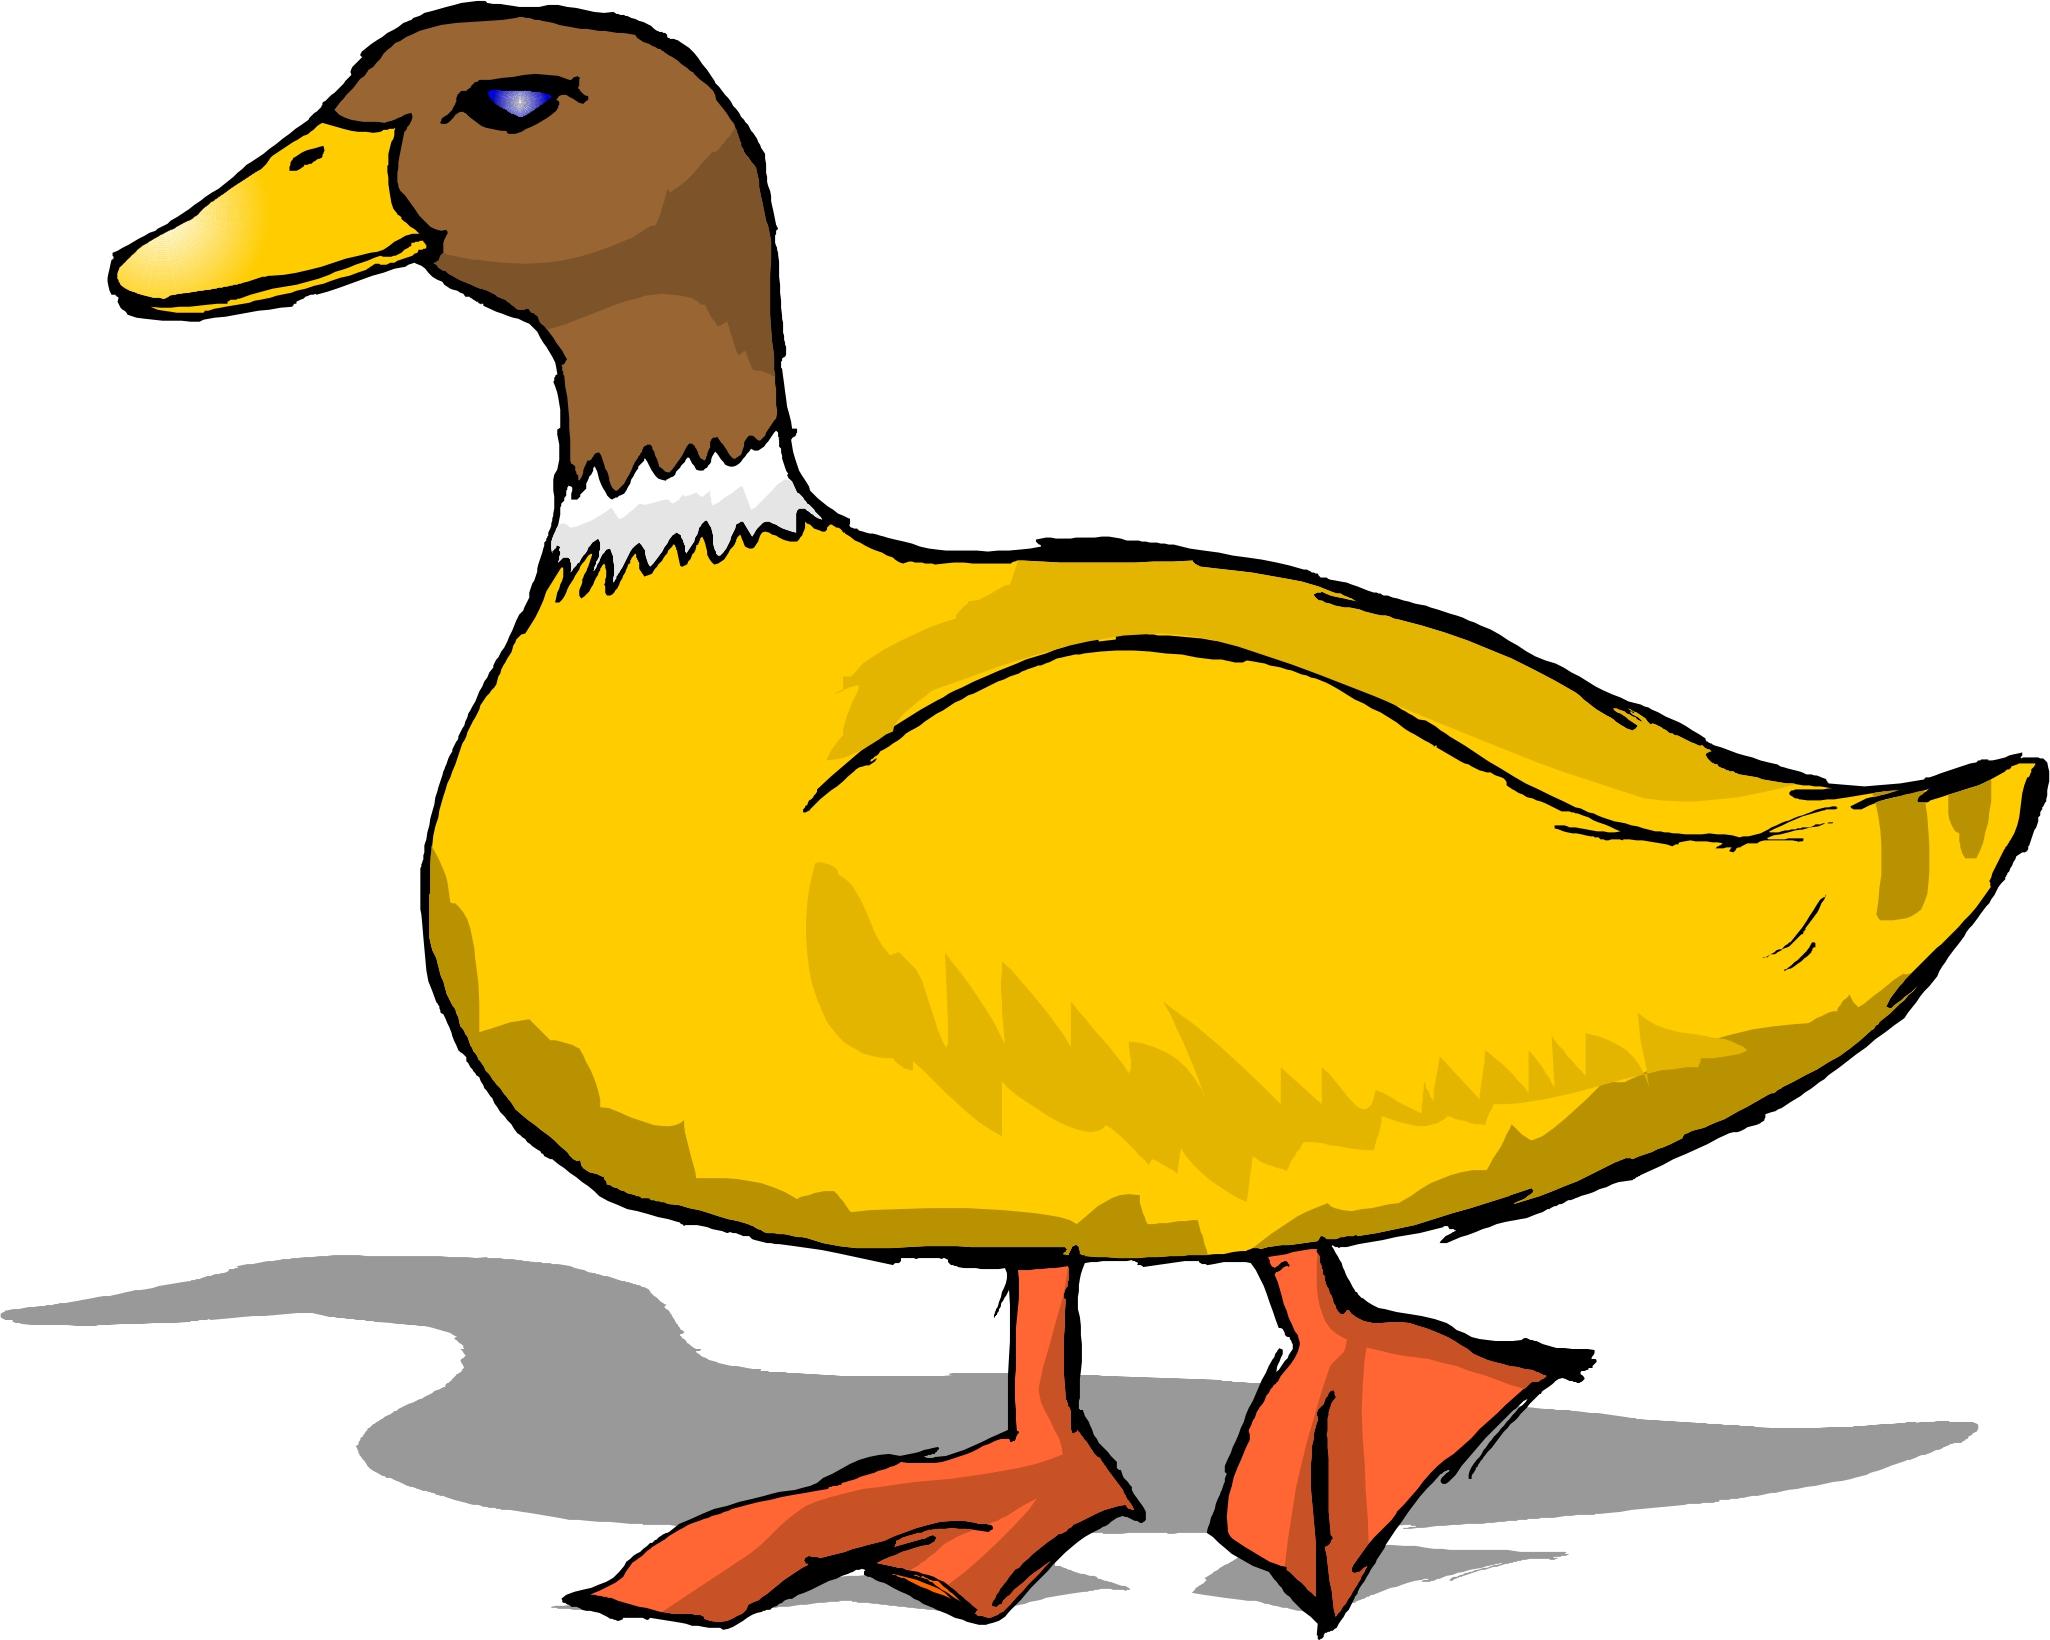 Duck clipart Cartoon image #11503 clipart Cartoon